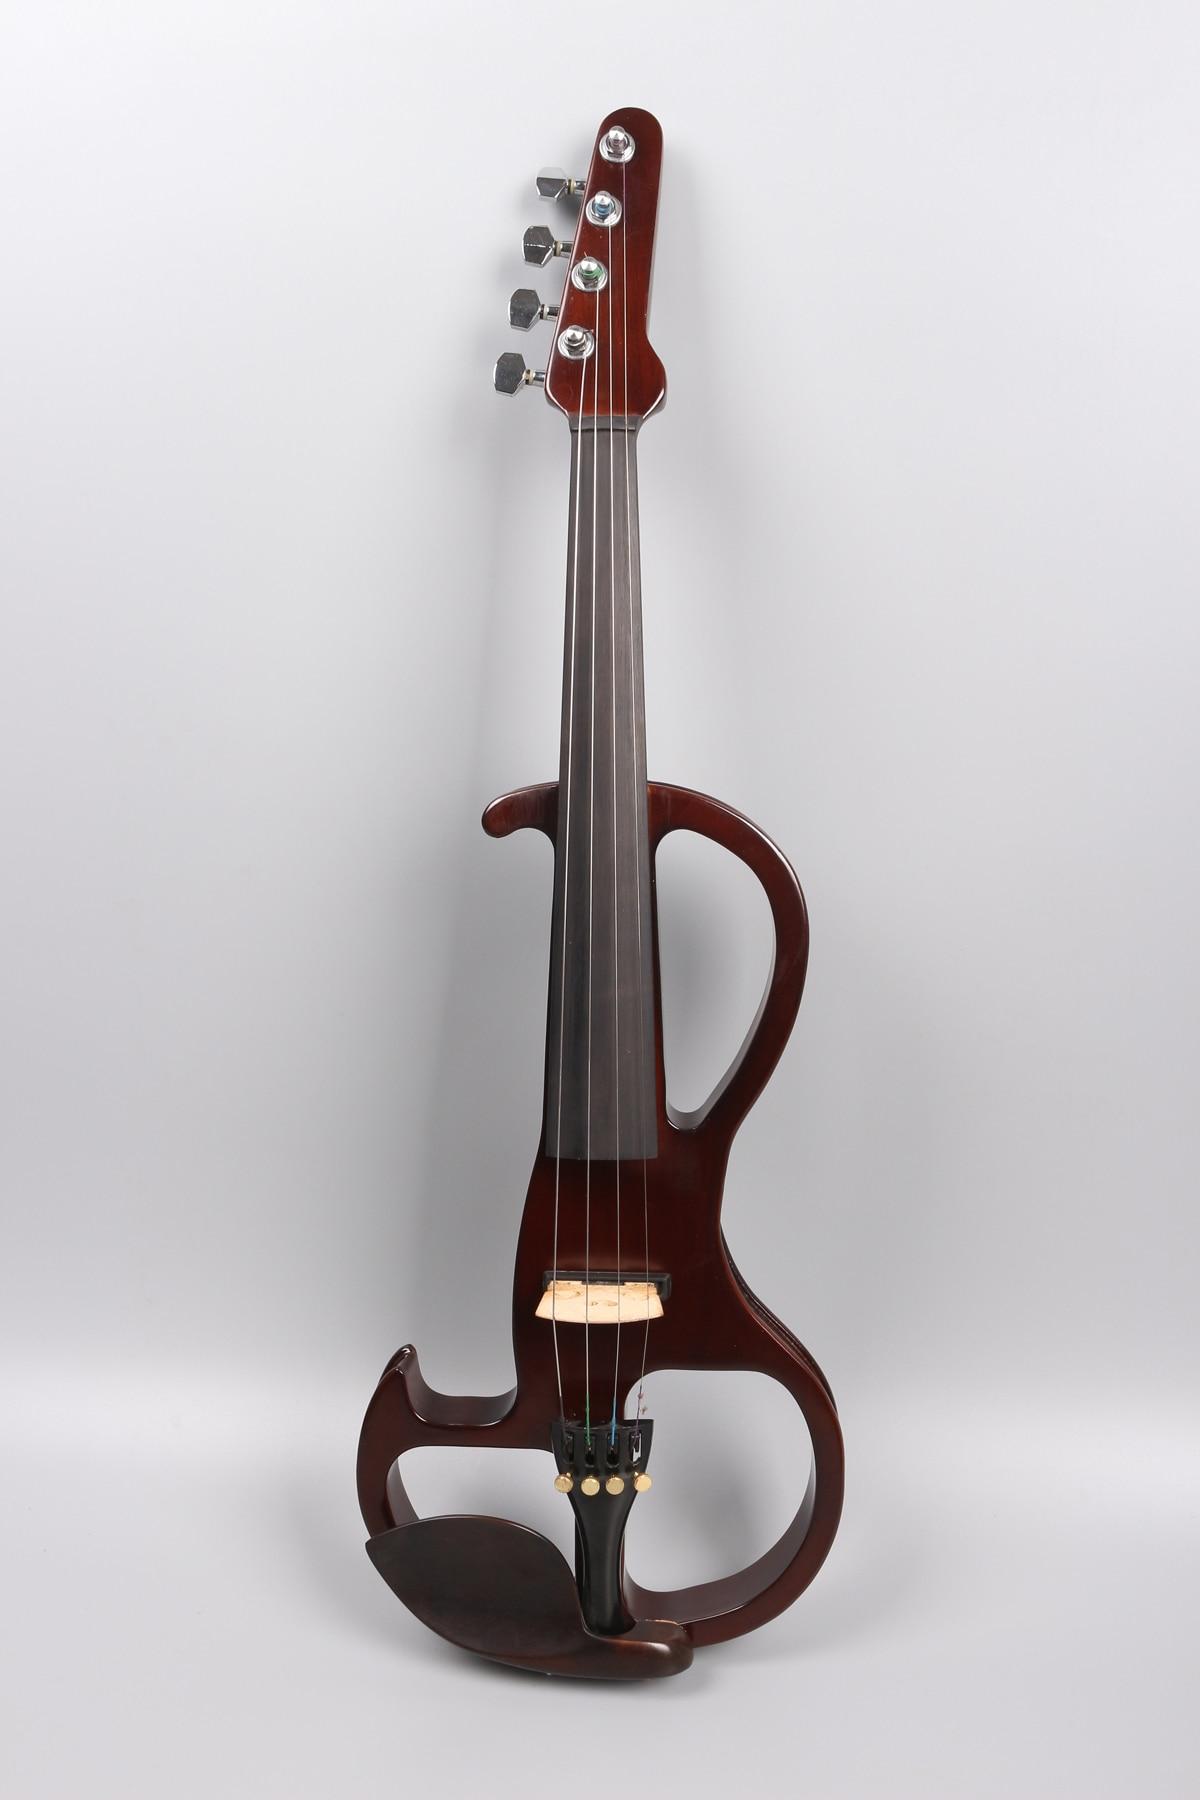 4/4 violín eléctrico de tamaño completo práctica mostrar de madera de arce w/auriculares guitarra cabeza 1/8 jack